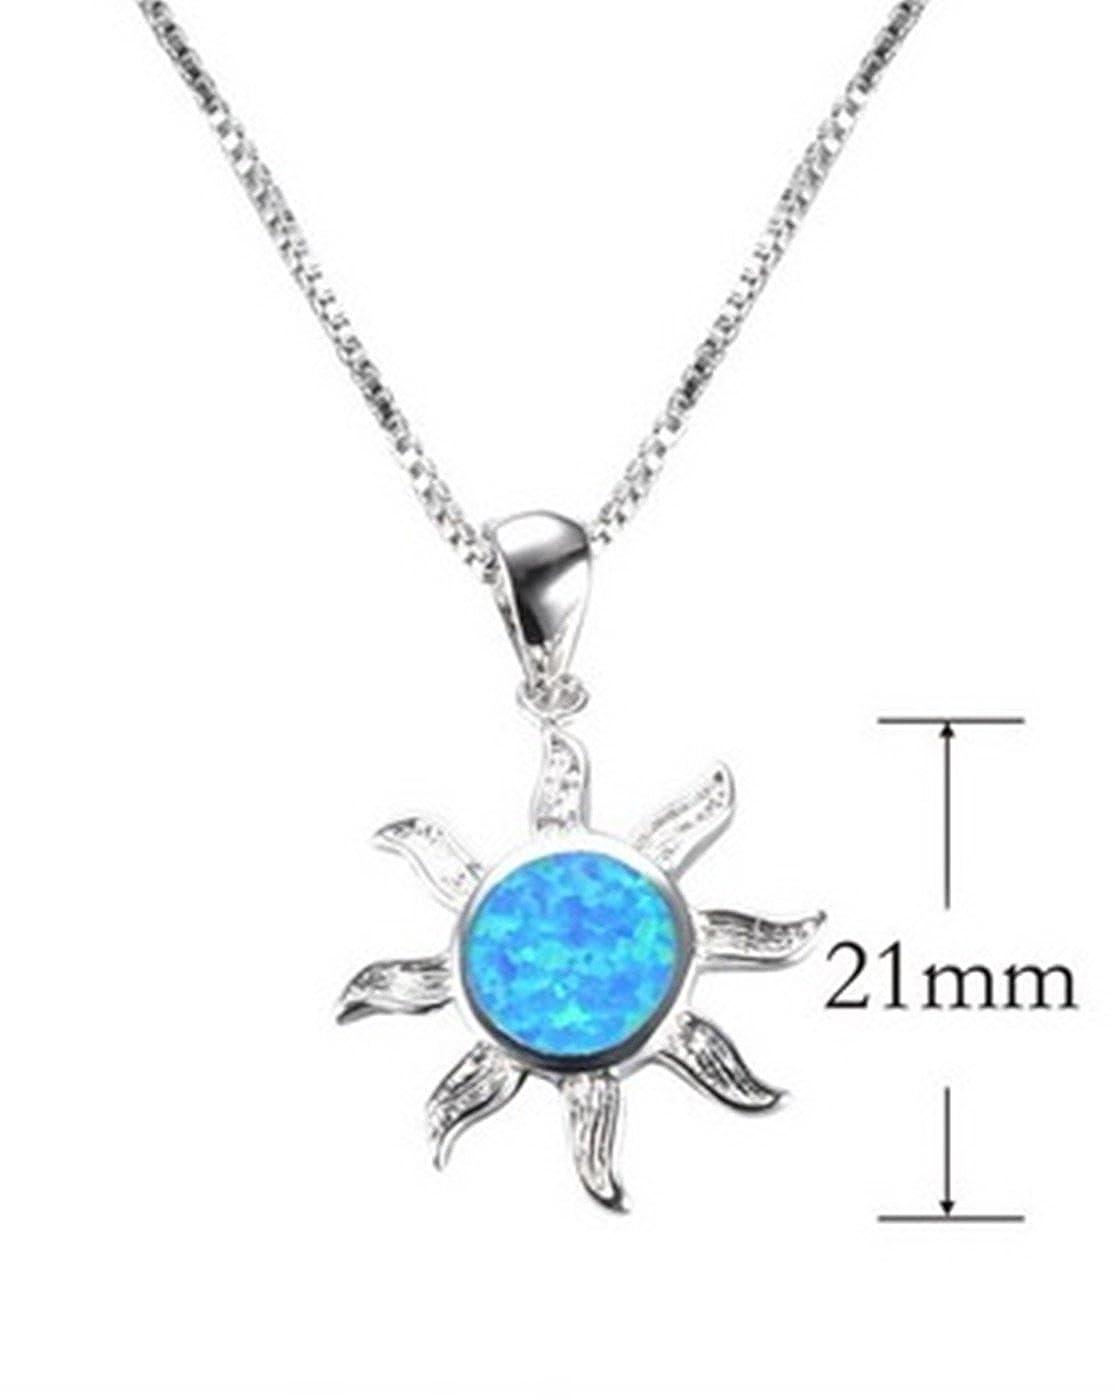 Fortonatori Created Blue Opal Necklace Heart Elegant 925 Silver Pendant Necklace 18 Chain